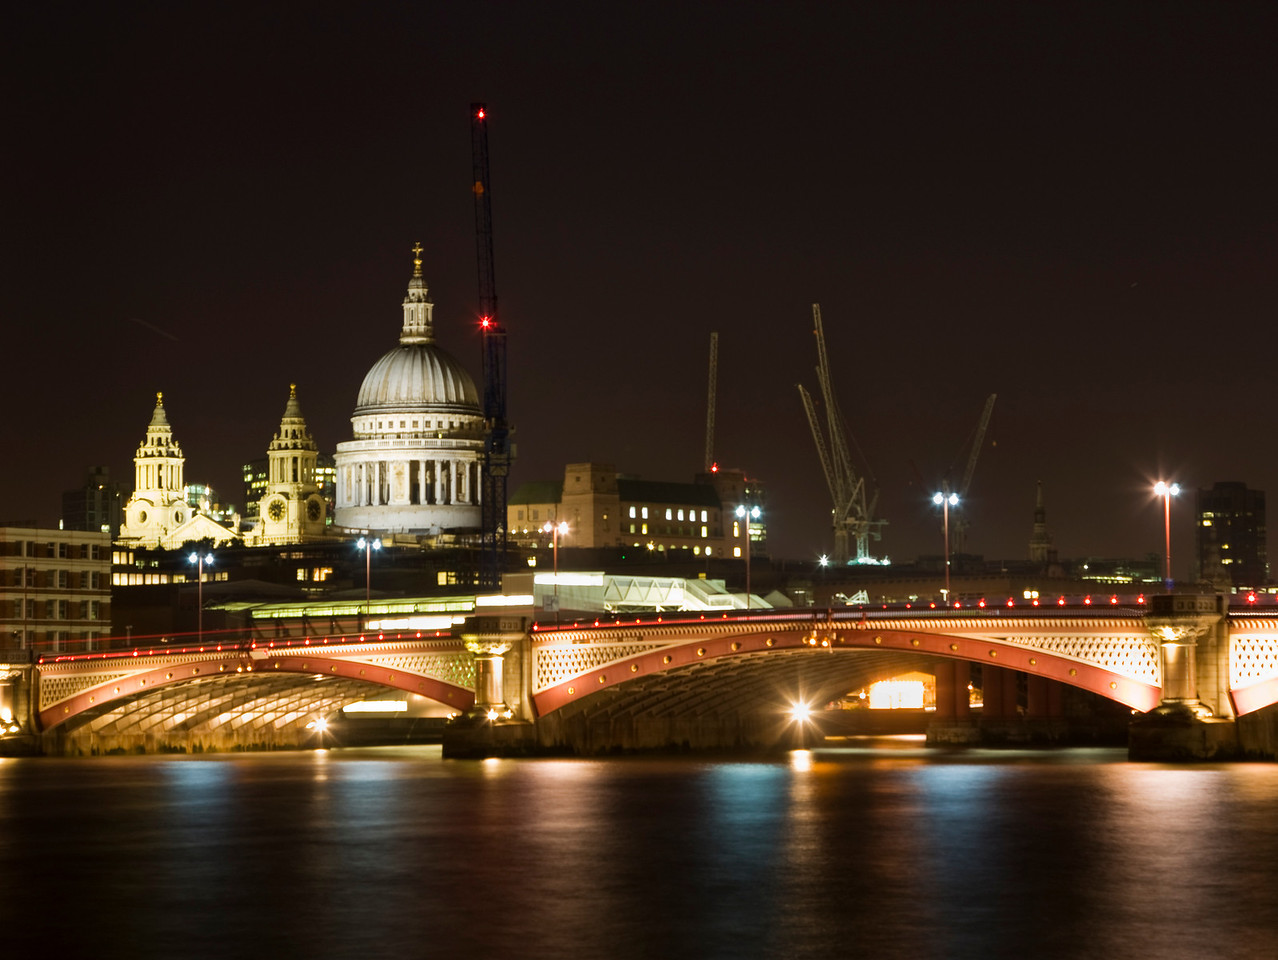 Blackfriars Bridge & St Paul's Cathedral at Night